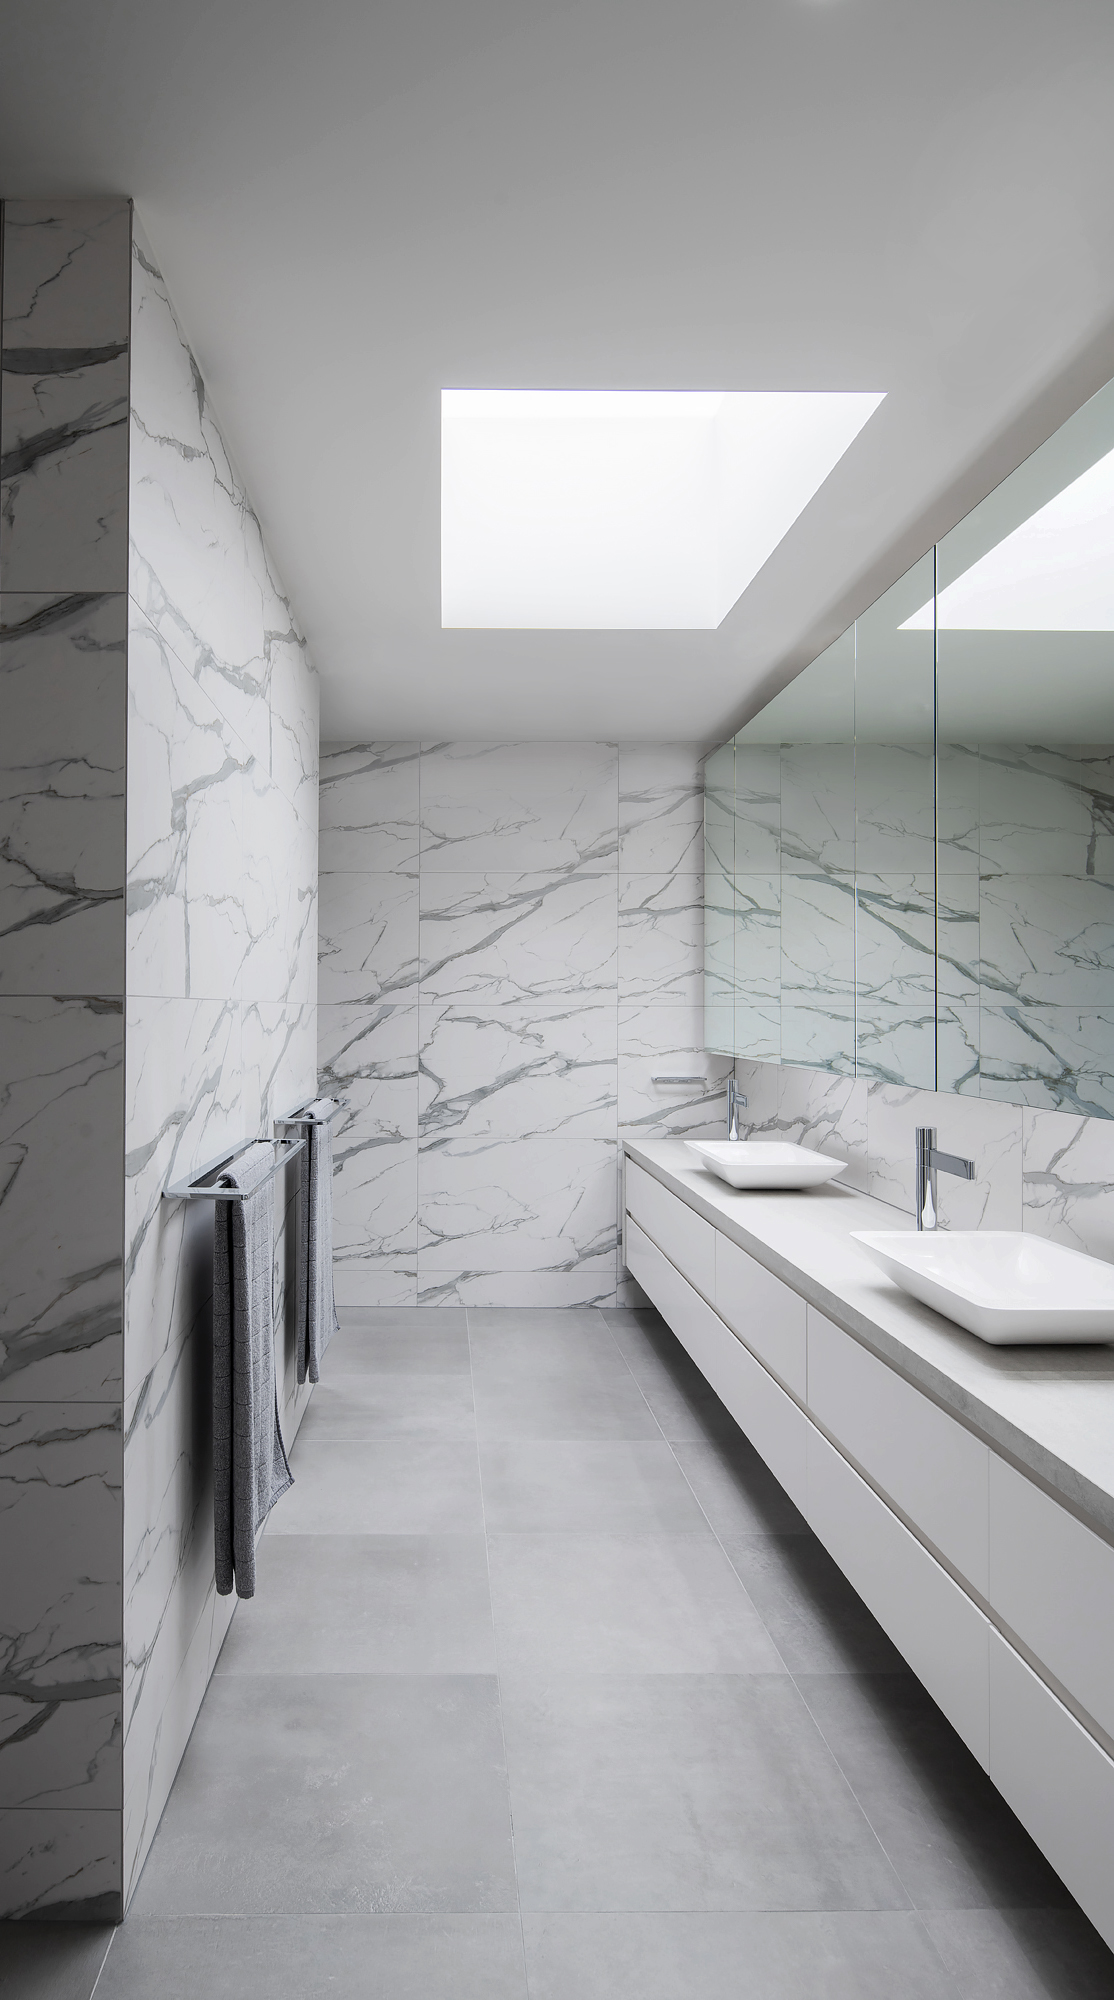 toorak-townhouses-bathrooms-by-c.kairouz-architects